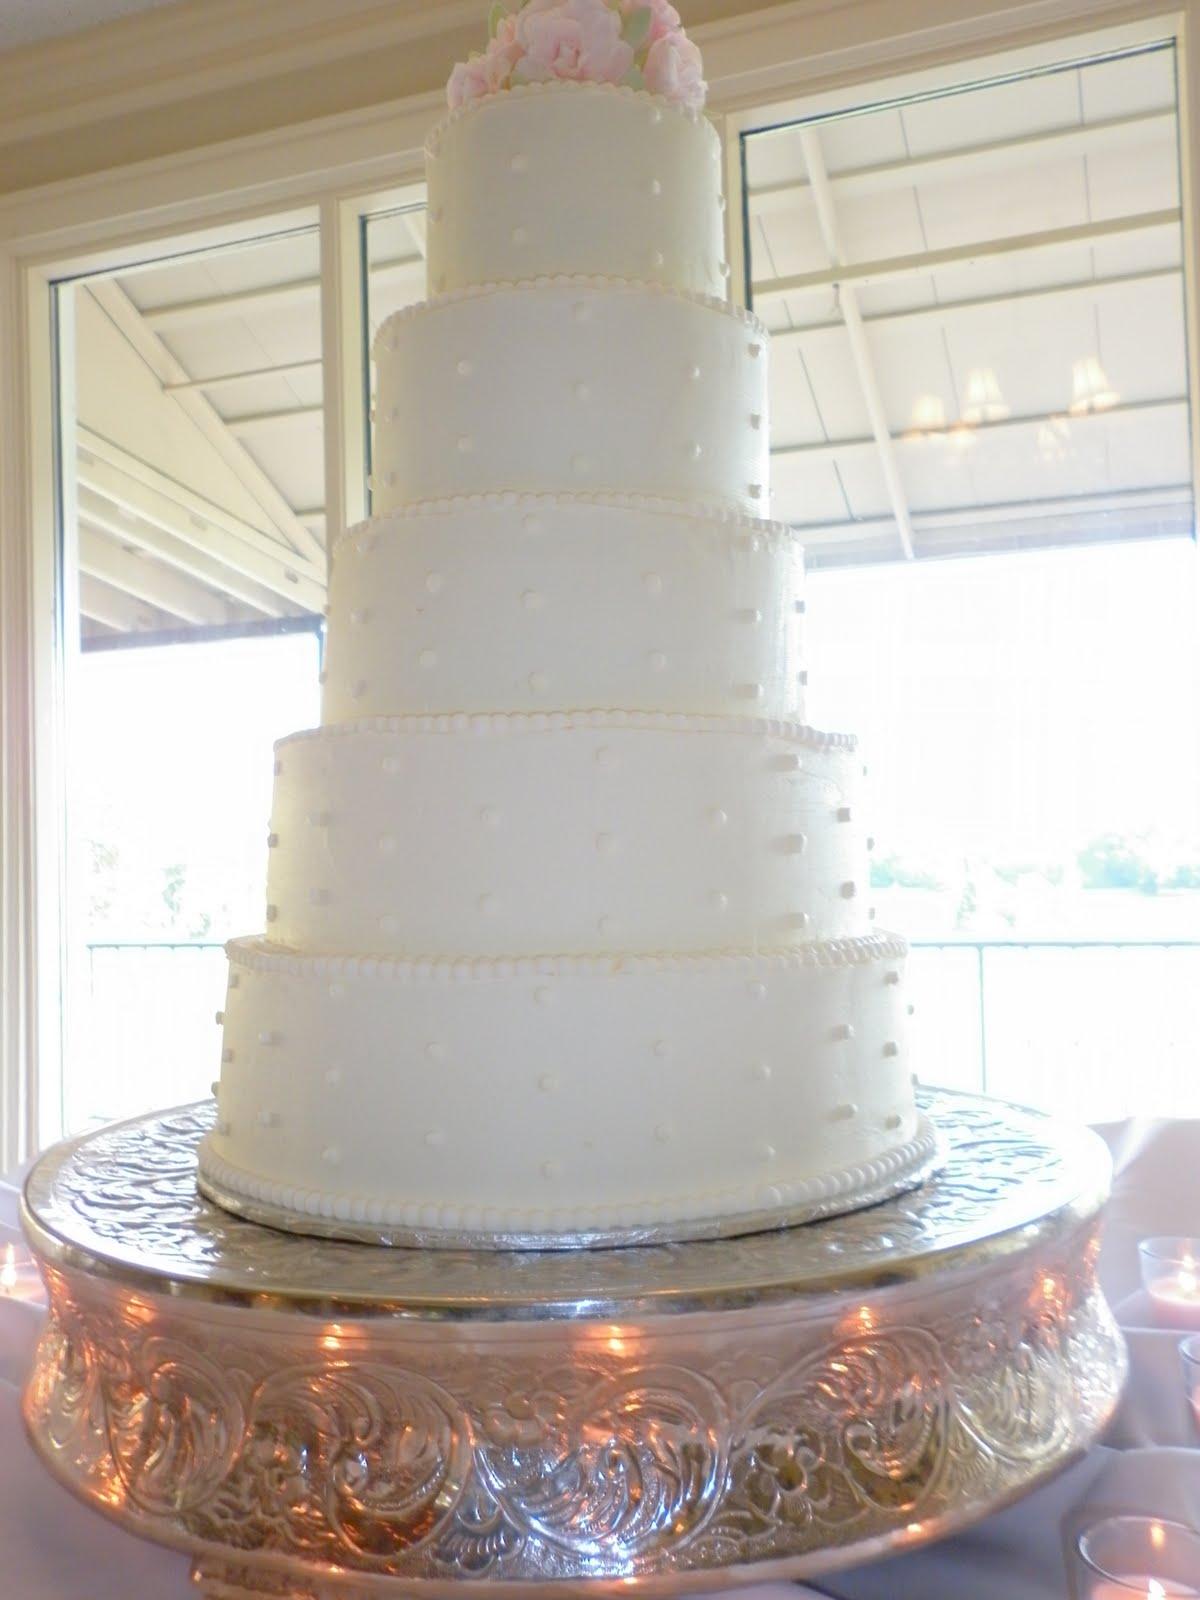 Tis So Sweet Cakes Wedding at Natchez Country Club